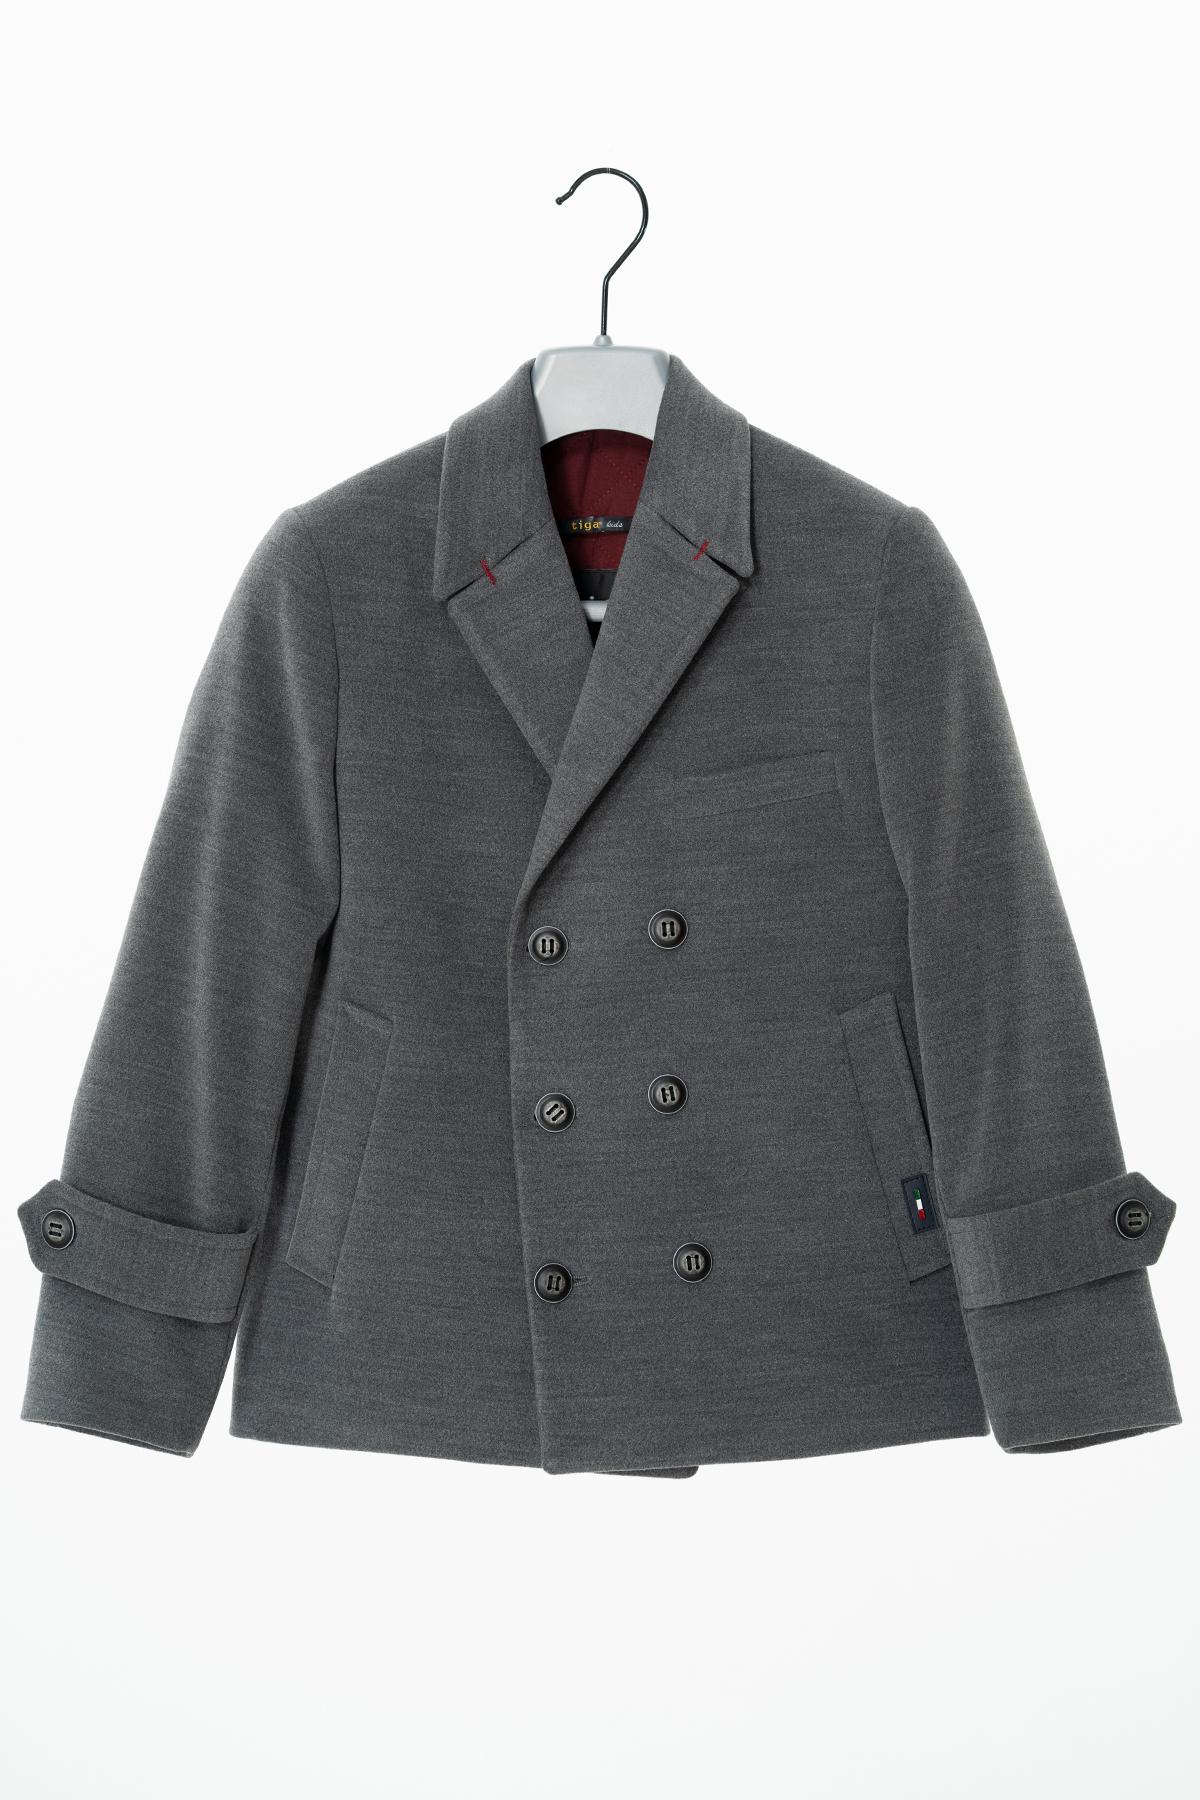 Kids Grey Coat